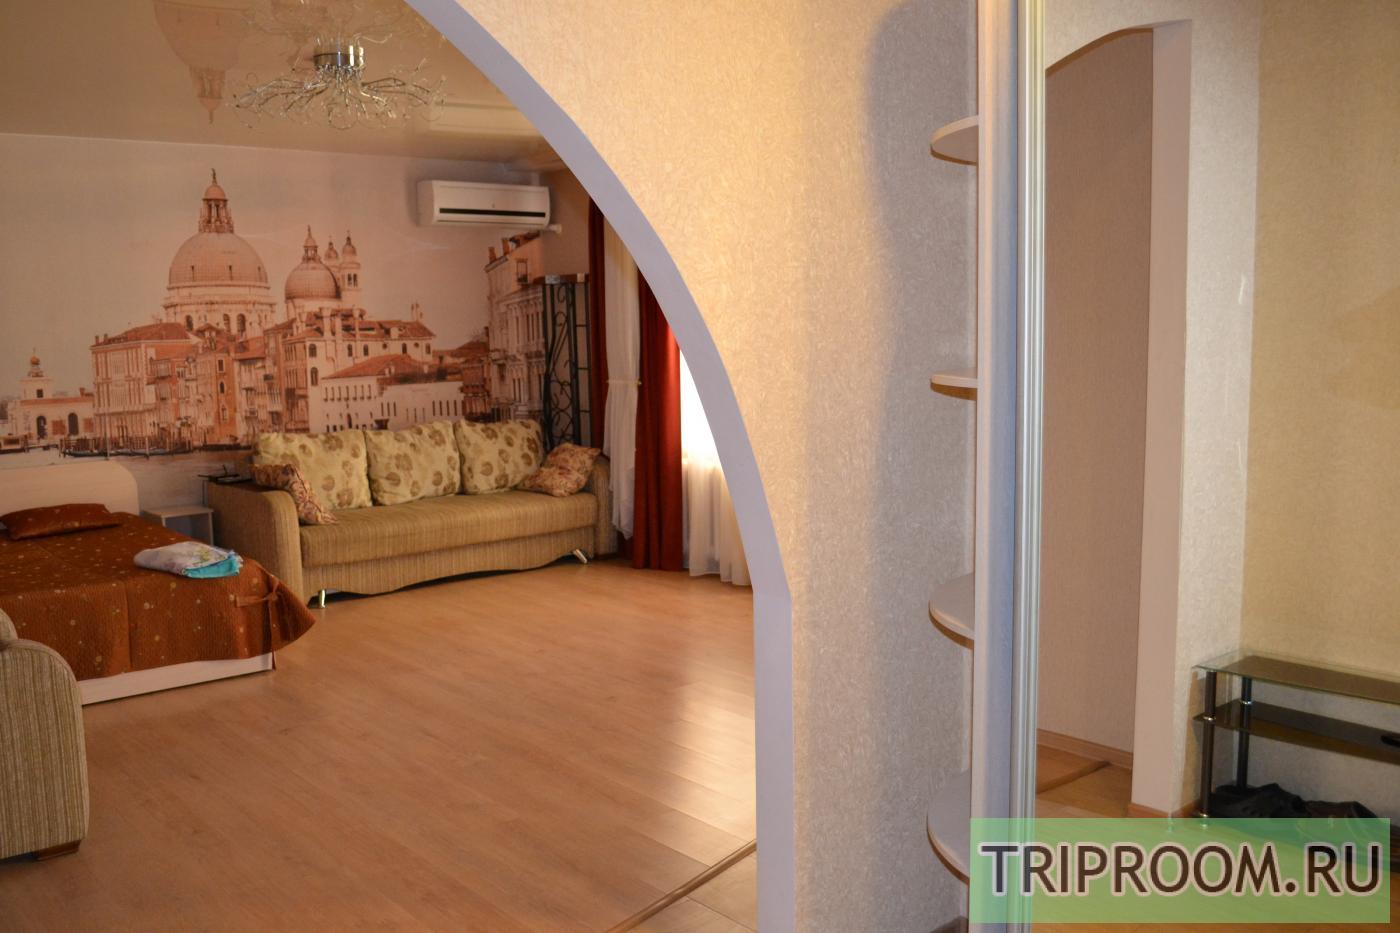 1-комнатная квартира посуточно (вариант № 591), ул. Революции проспект, фото № 10